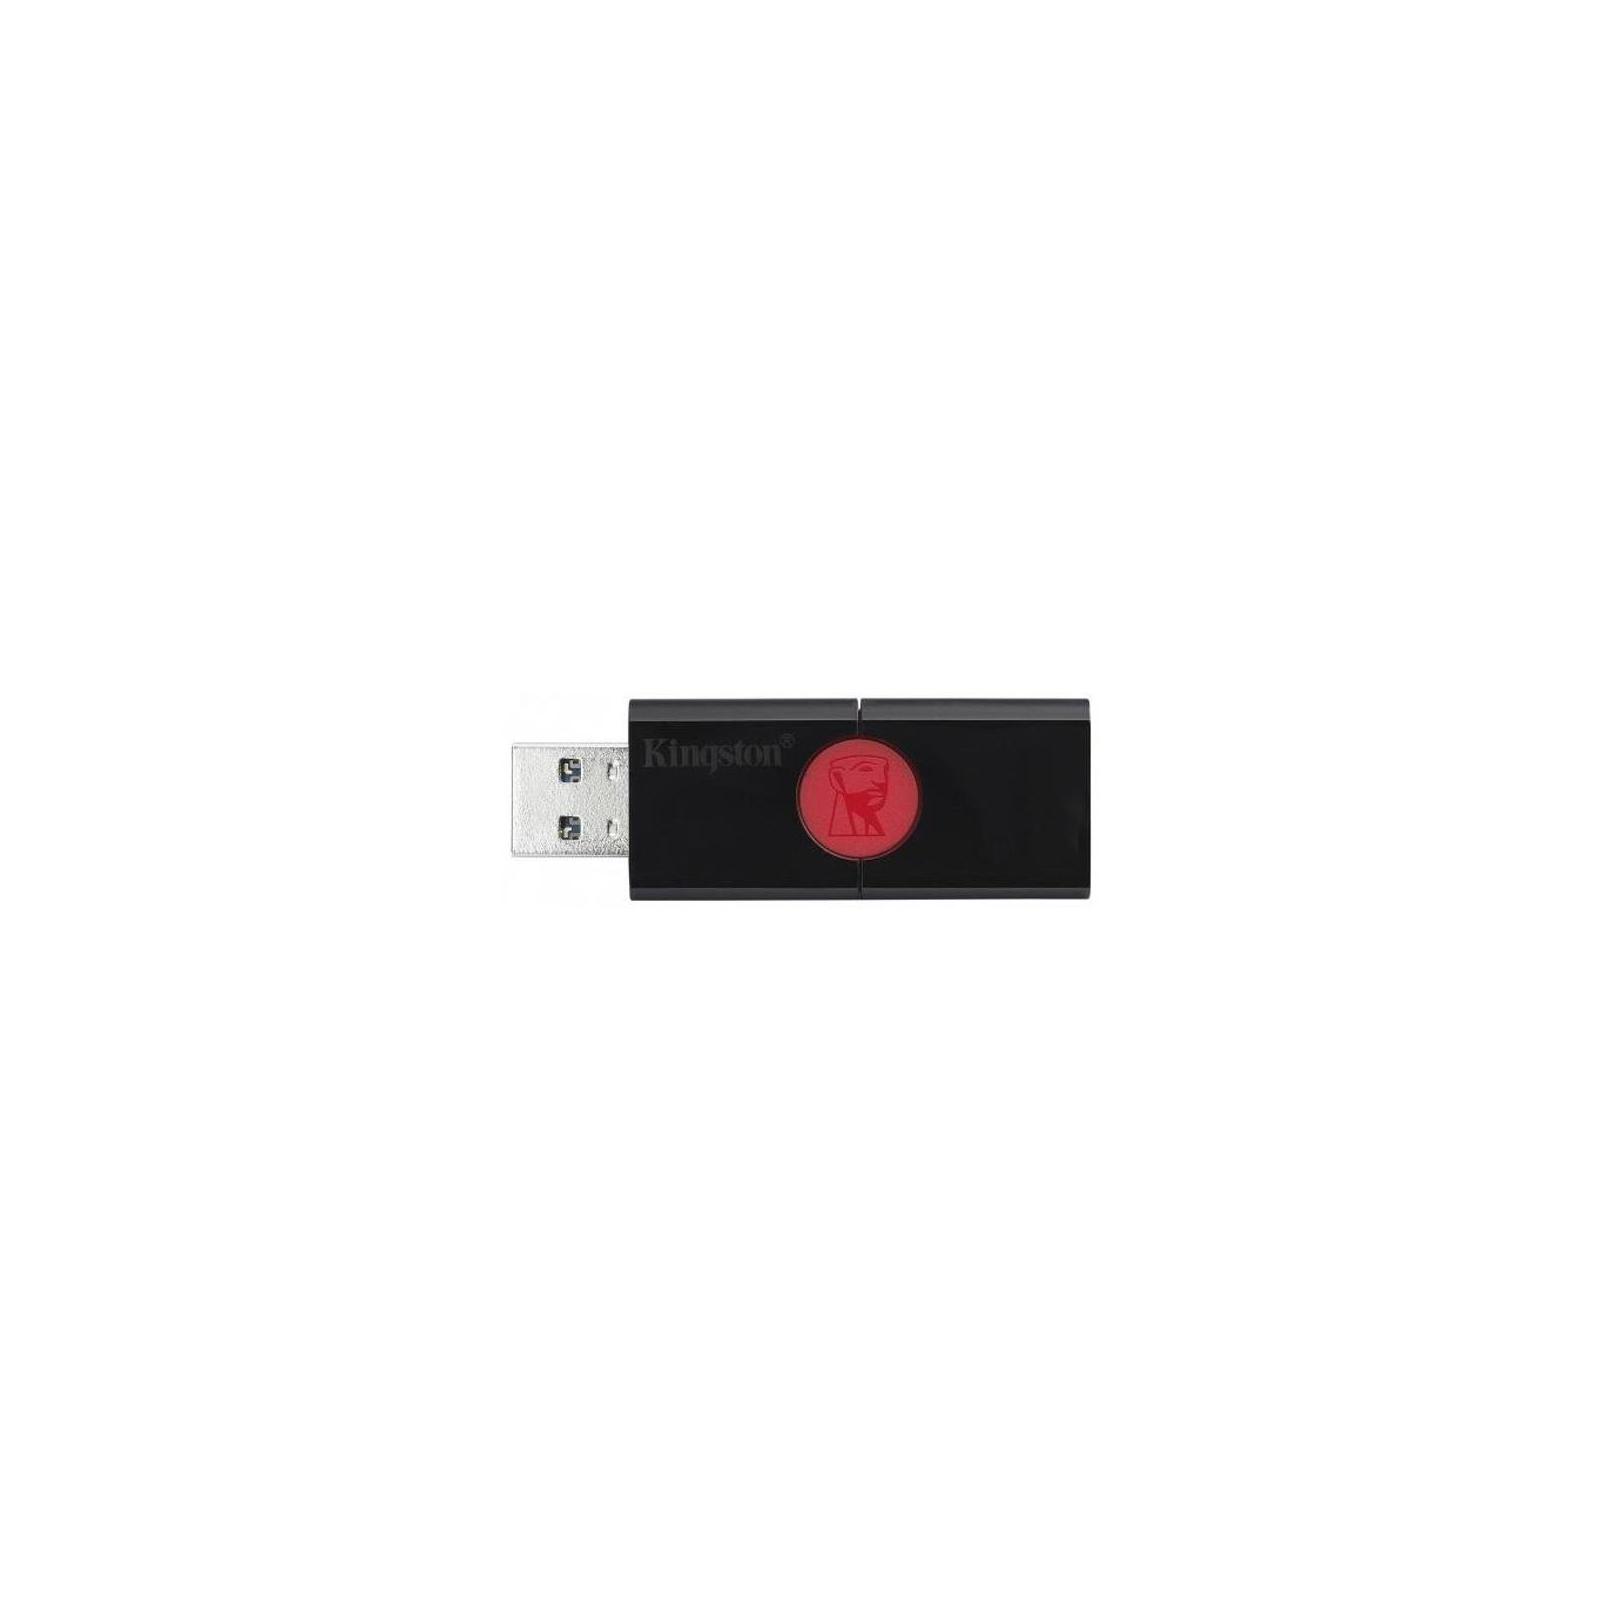 USB флеш накопитель Kingston 256GB DT106 USB 3.0 (DT106/256GB) изображение 3